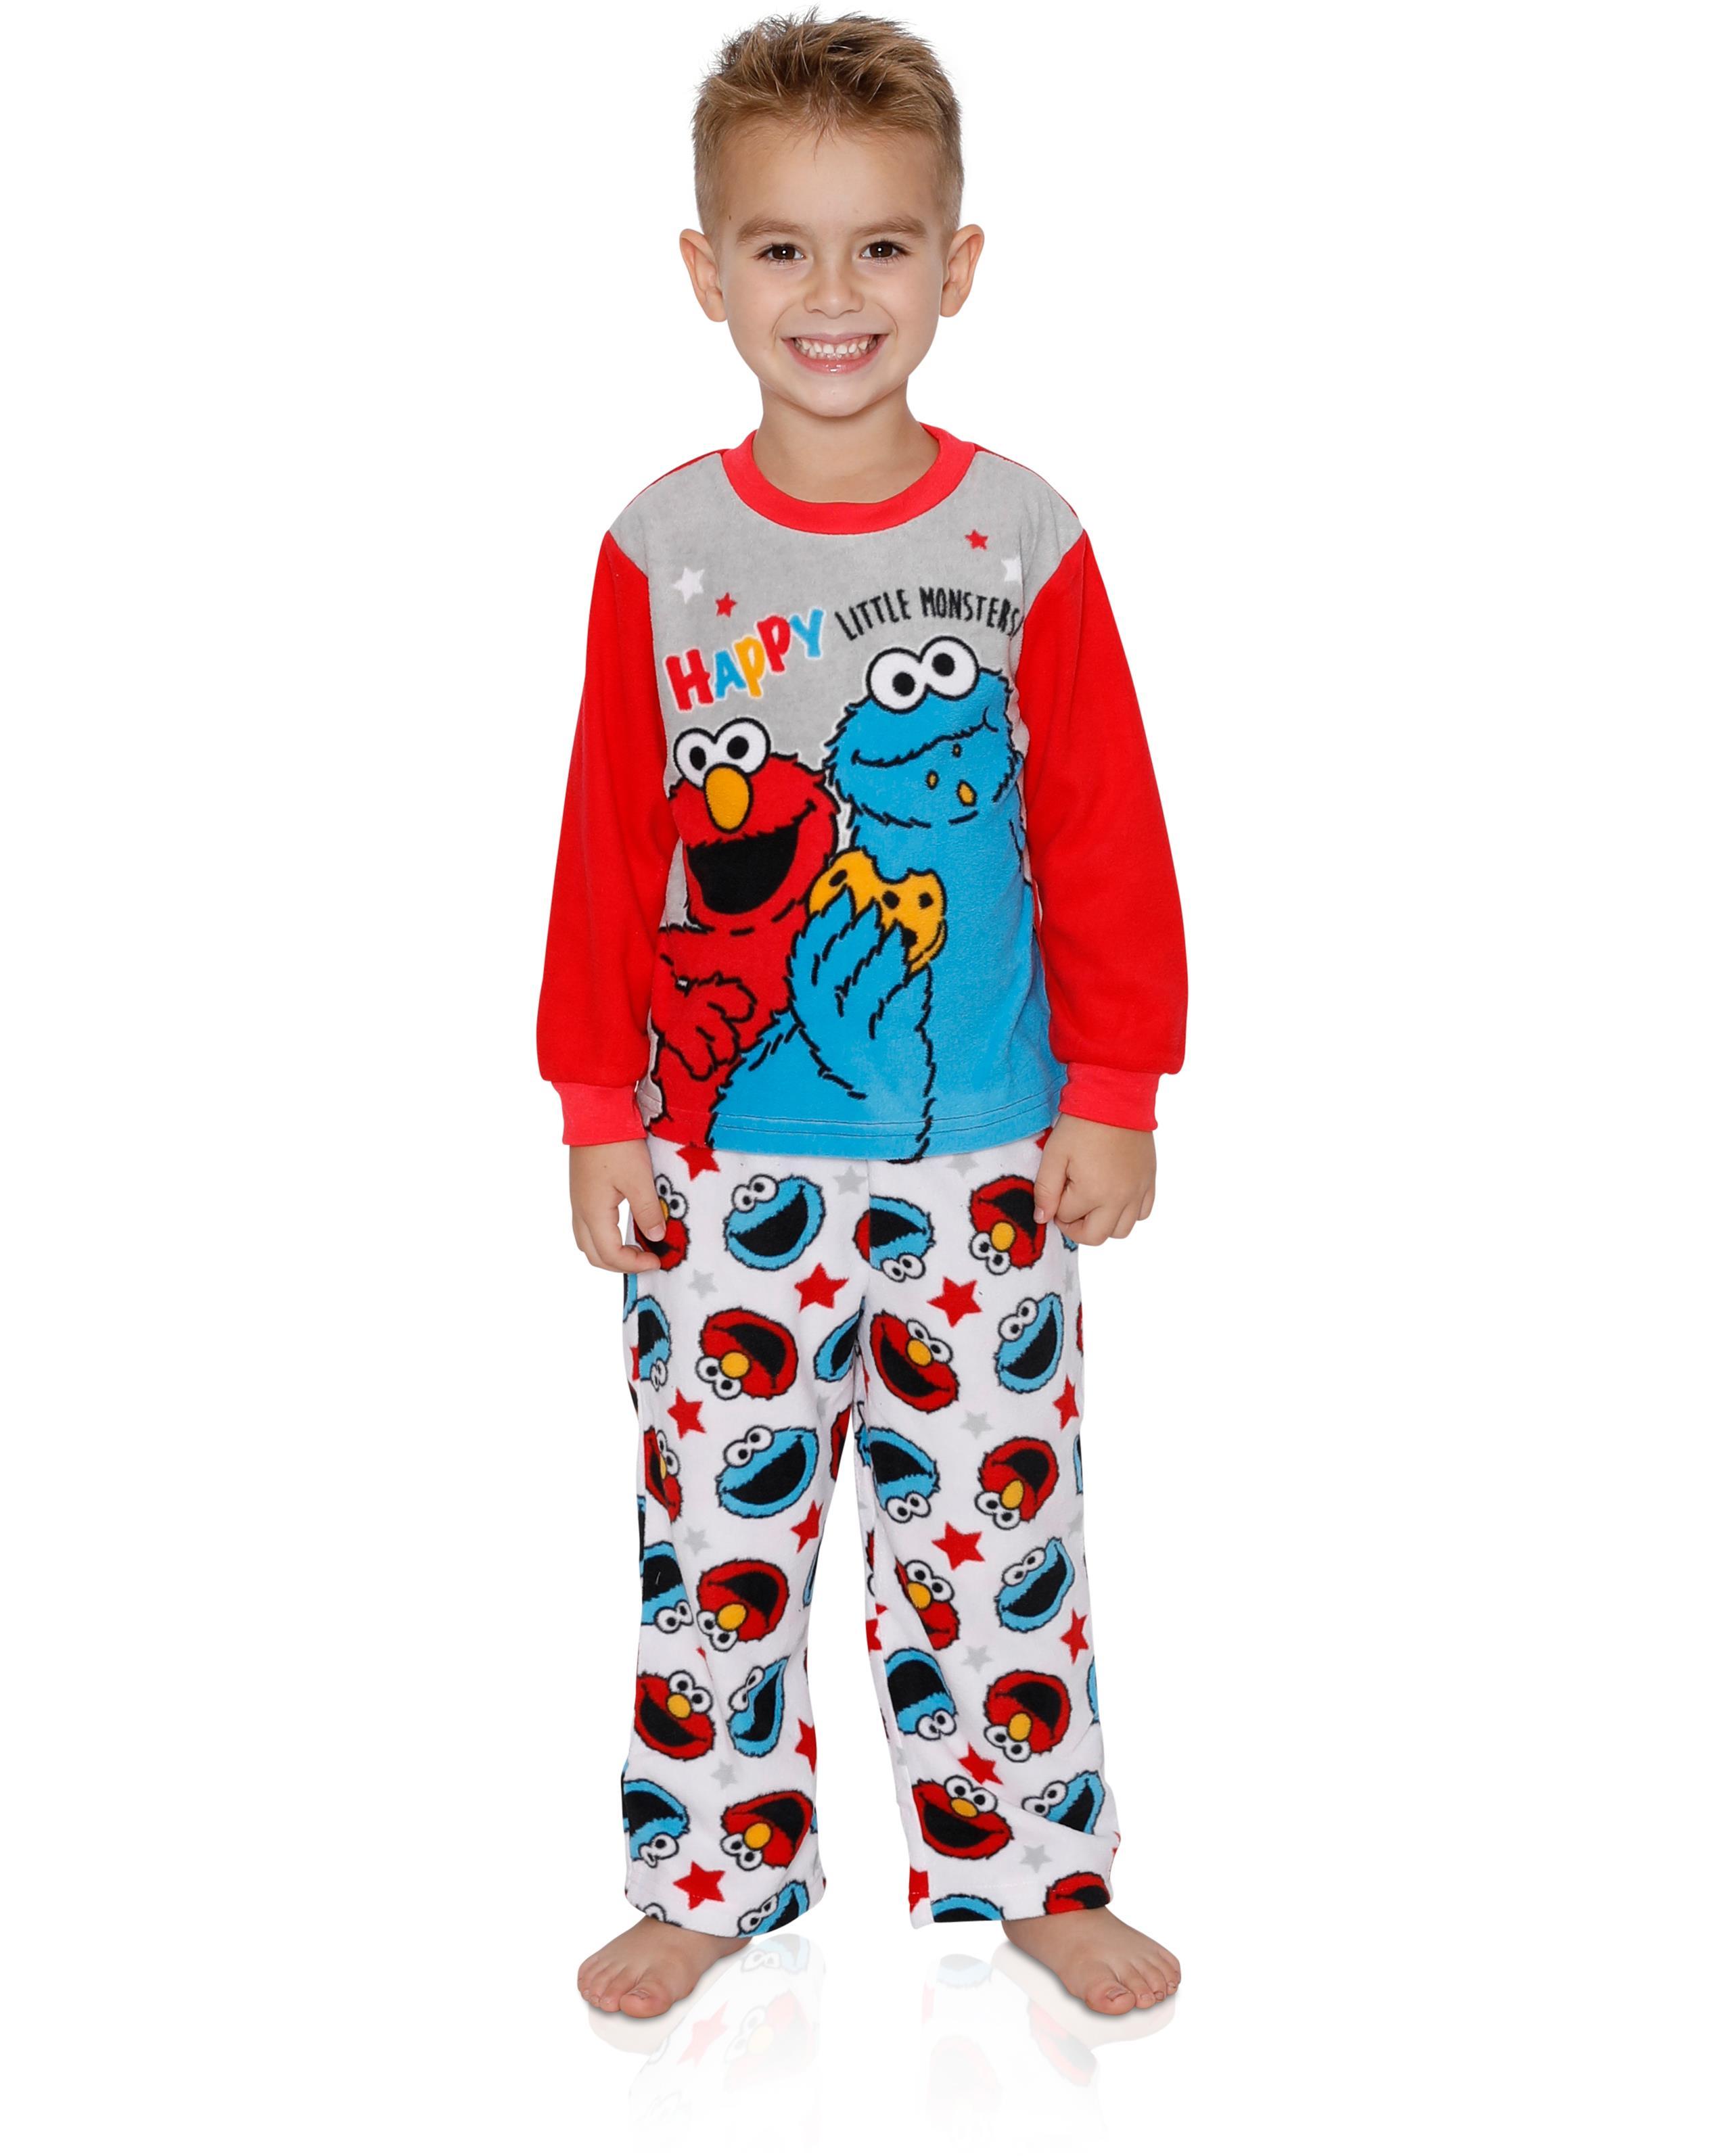 44550e56f Sesame Street Elmo Cookie Monster Baby Toddler Boys 2-Piece ...